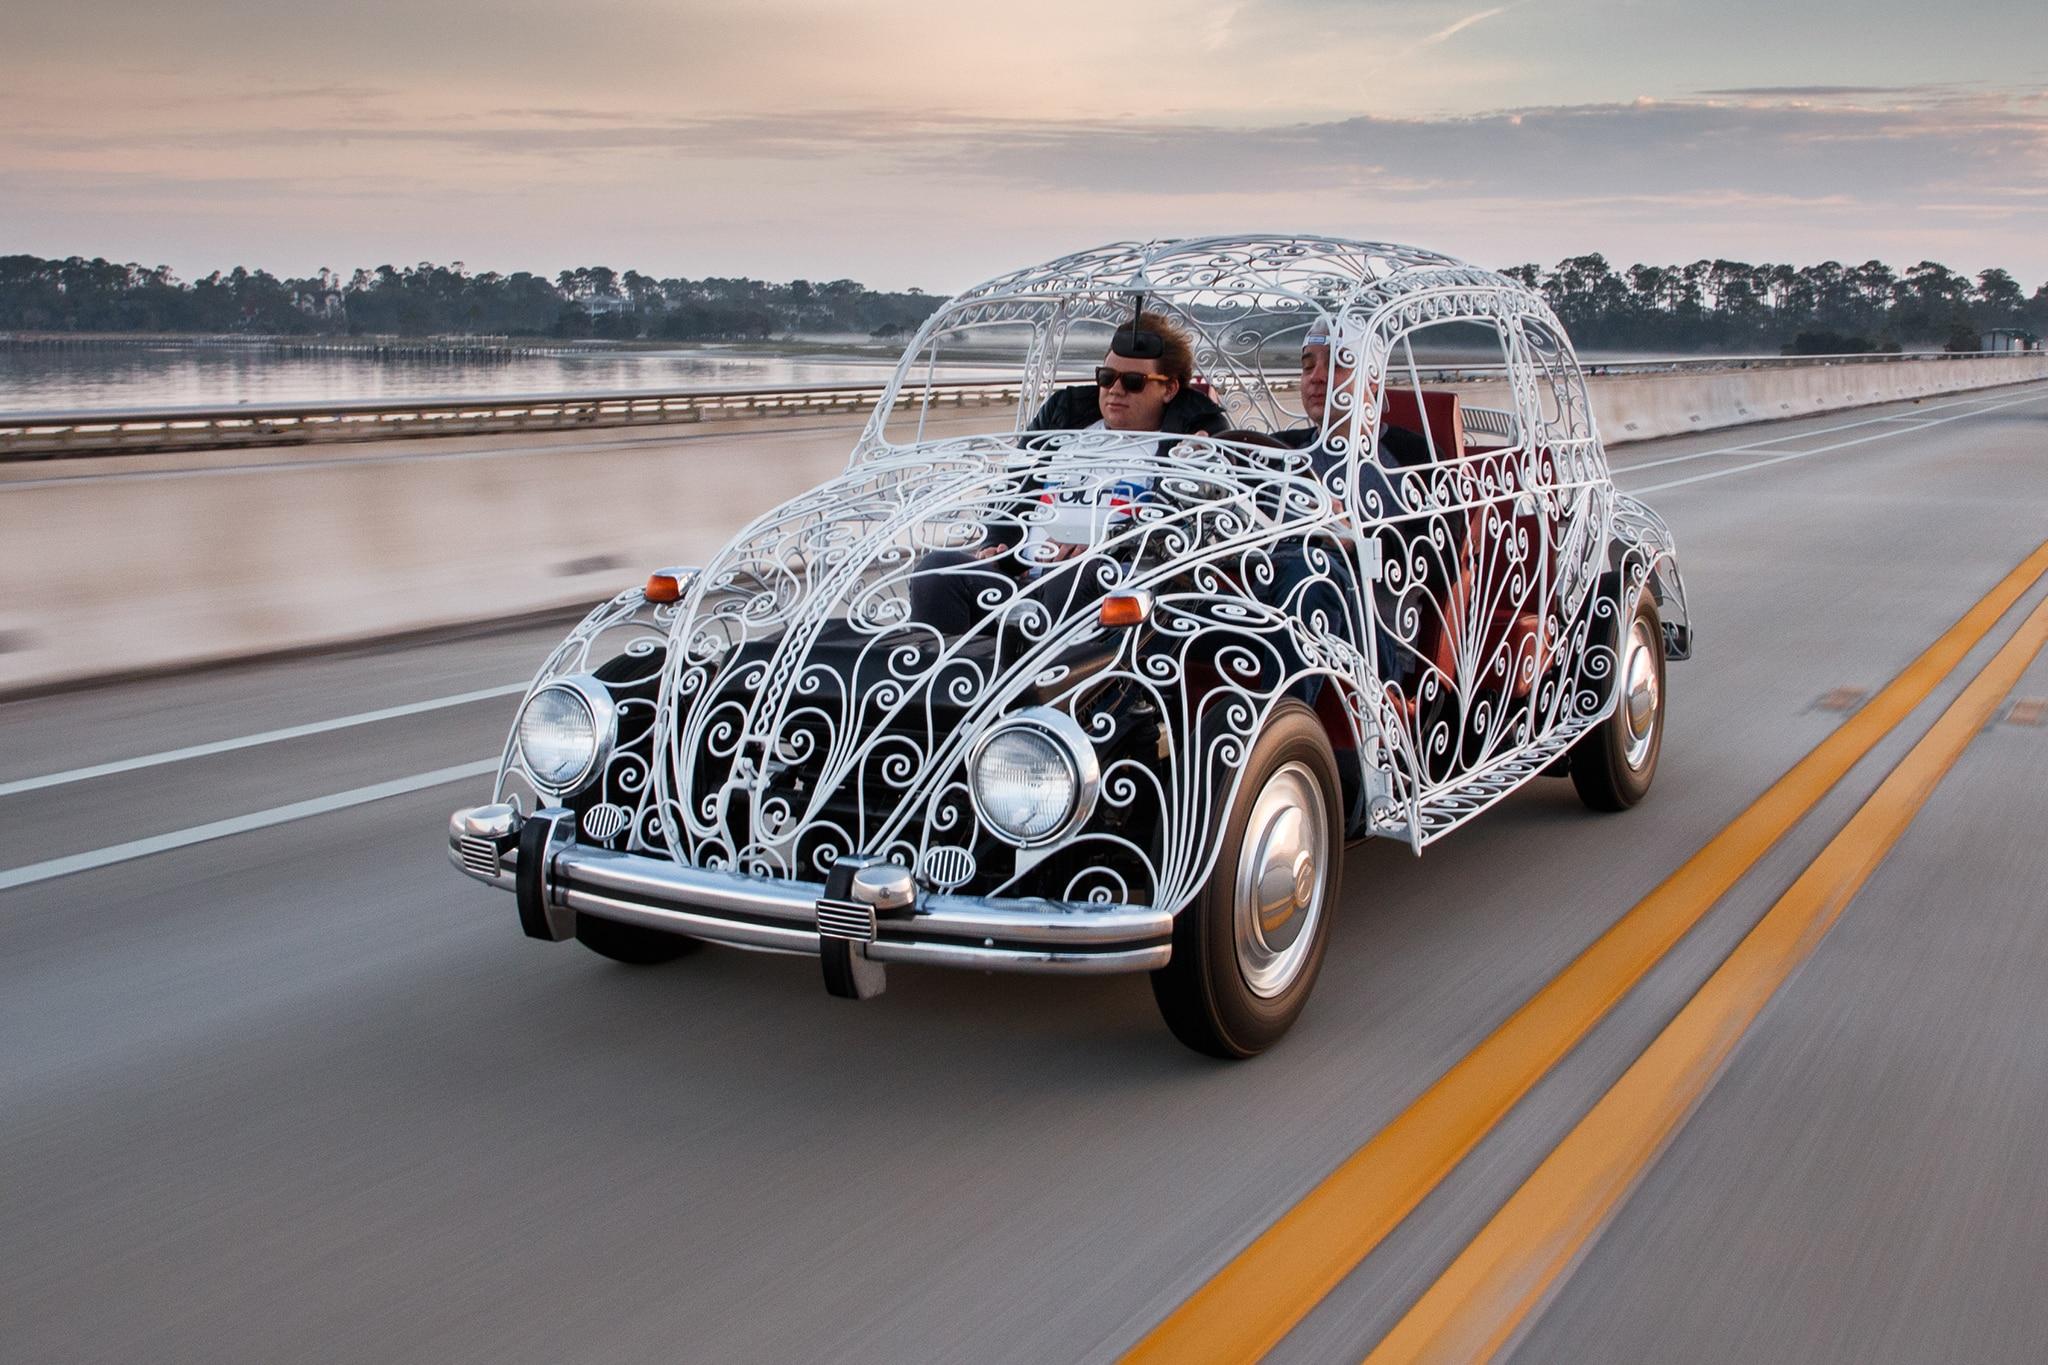 Maximum Airflow Driving A Wrought Iron Vw Wedding Beetle